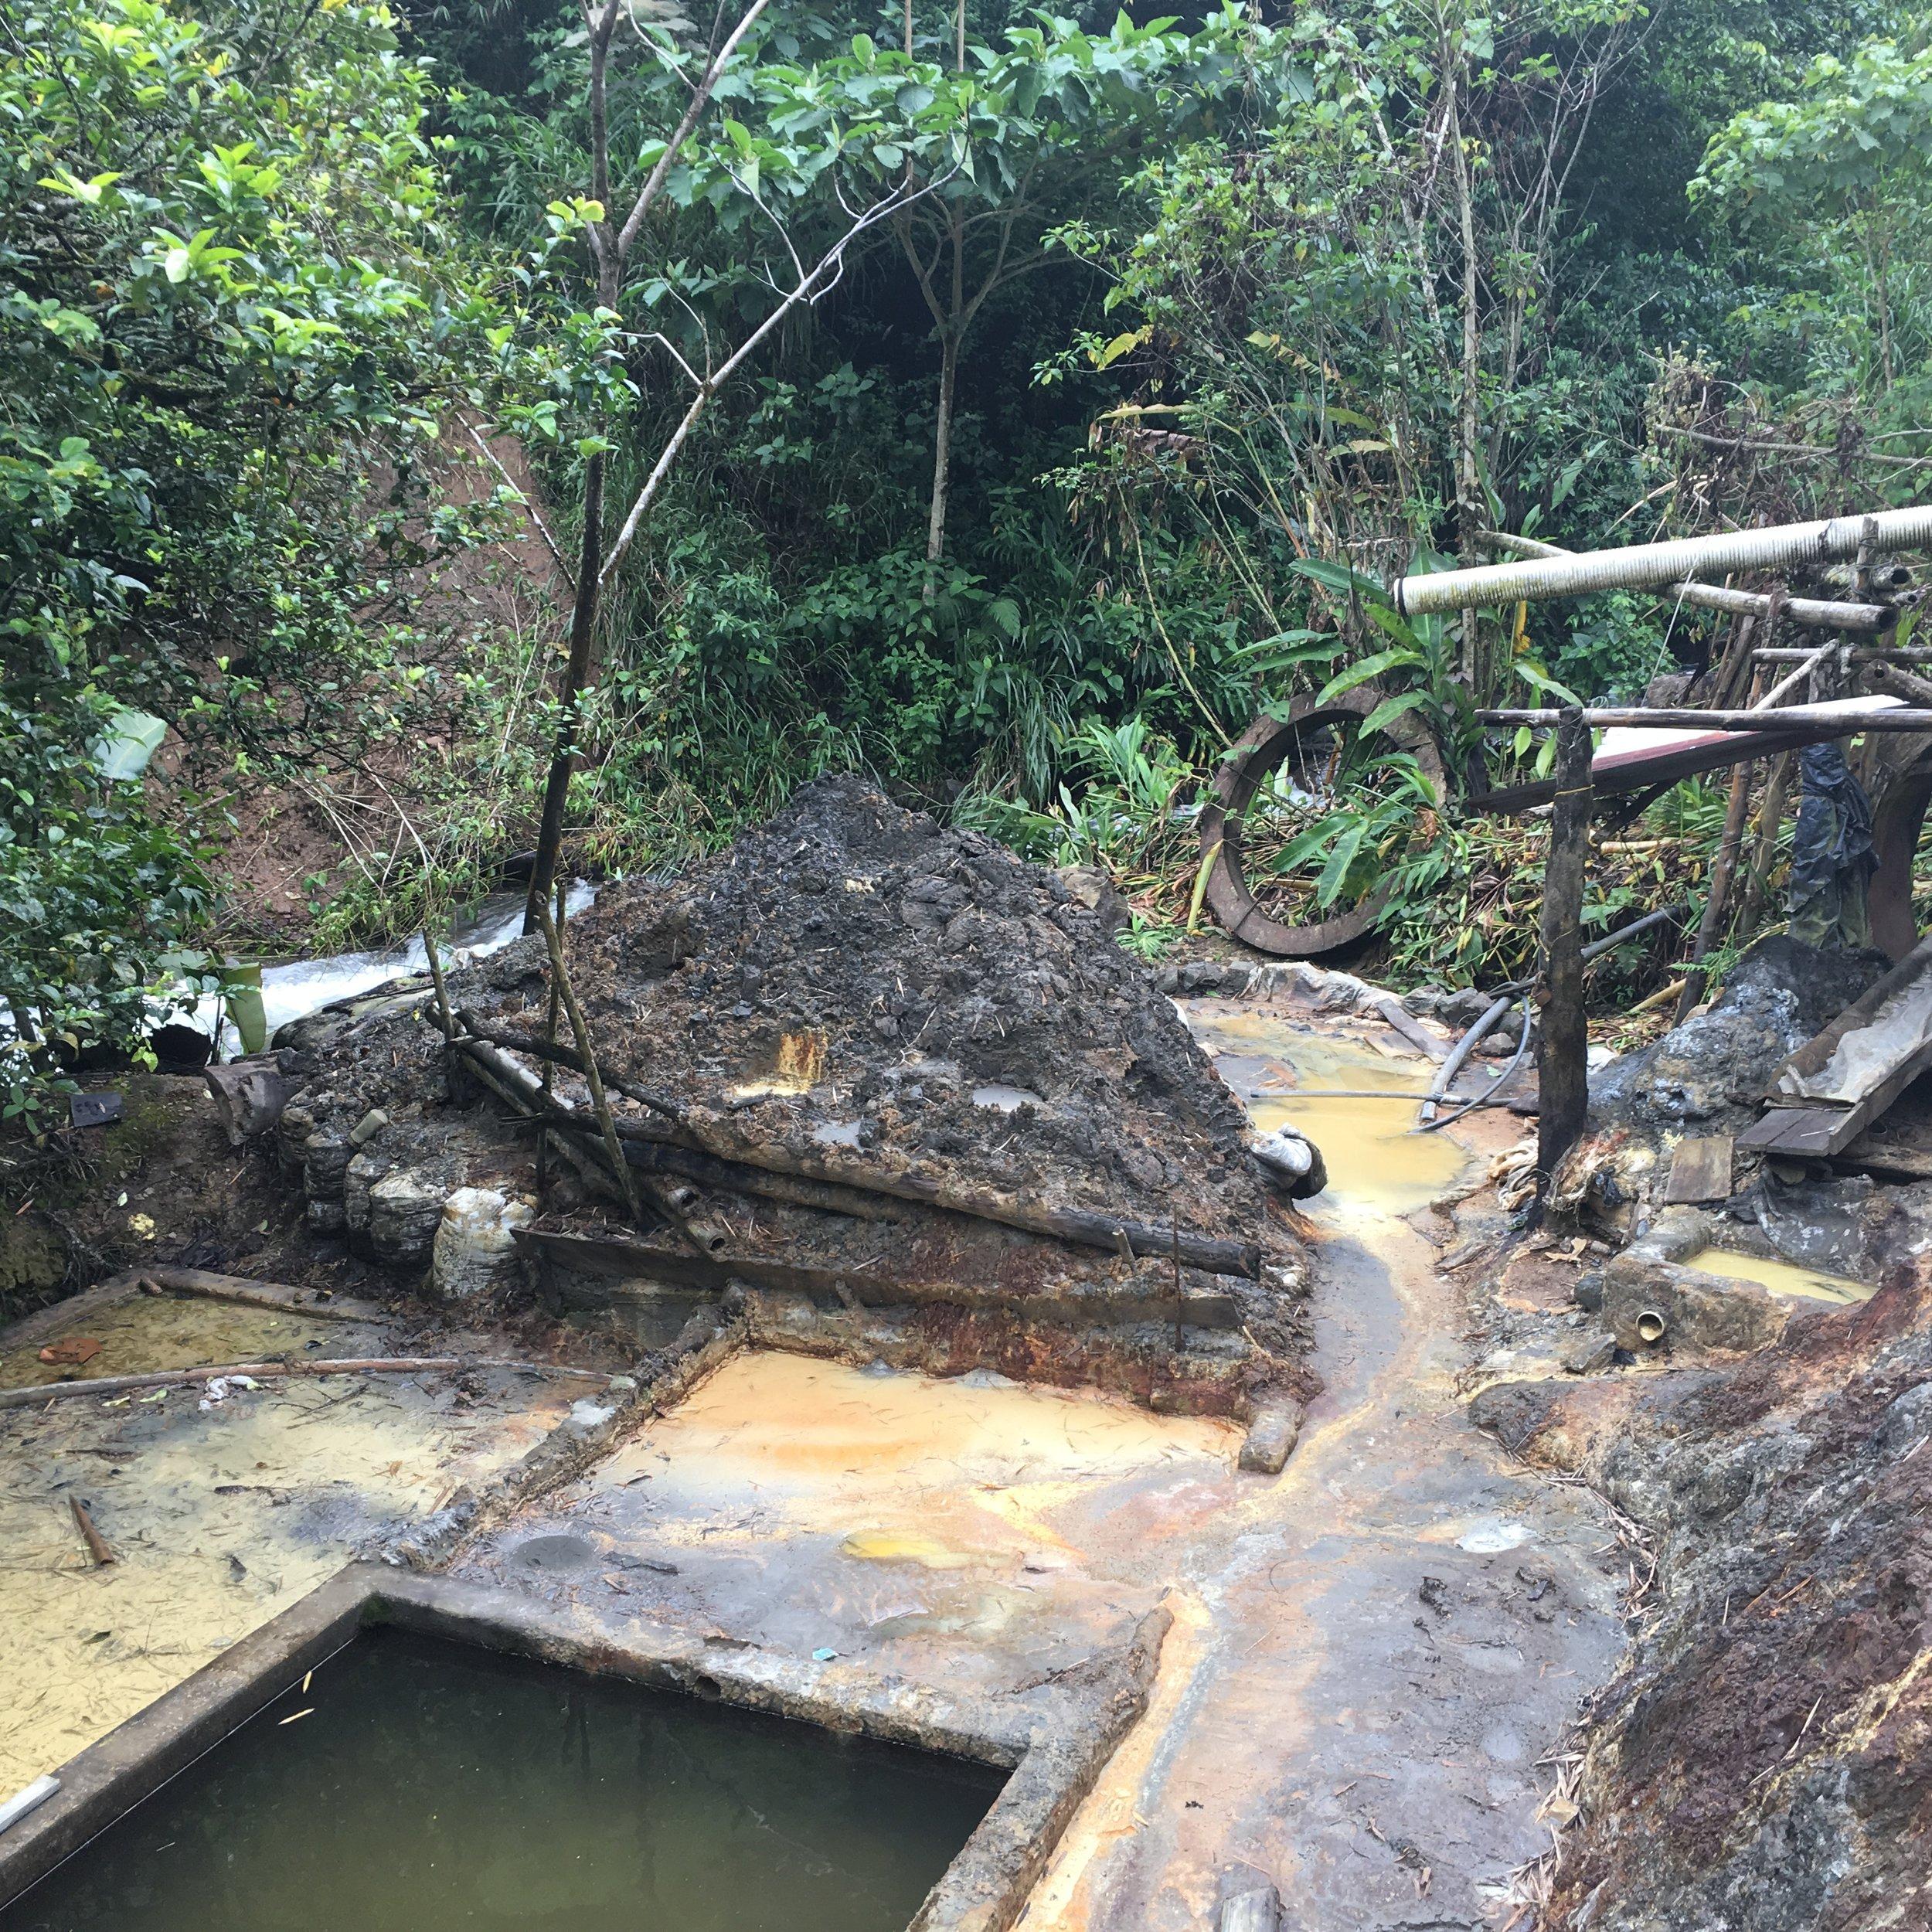 Mercury contaminated area adjacent to the Hondo River, Colombia. Photo: Video still, courtesy of France 24, Spanish language television program.